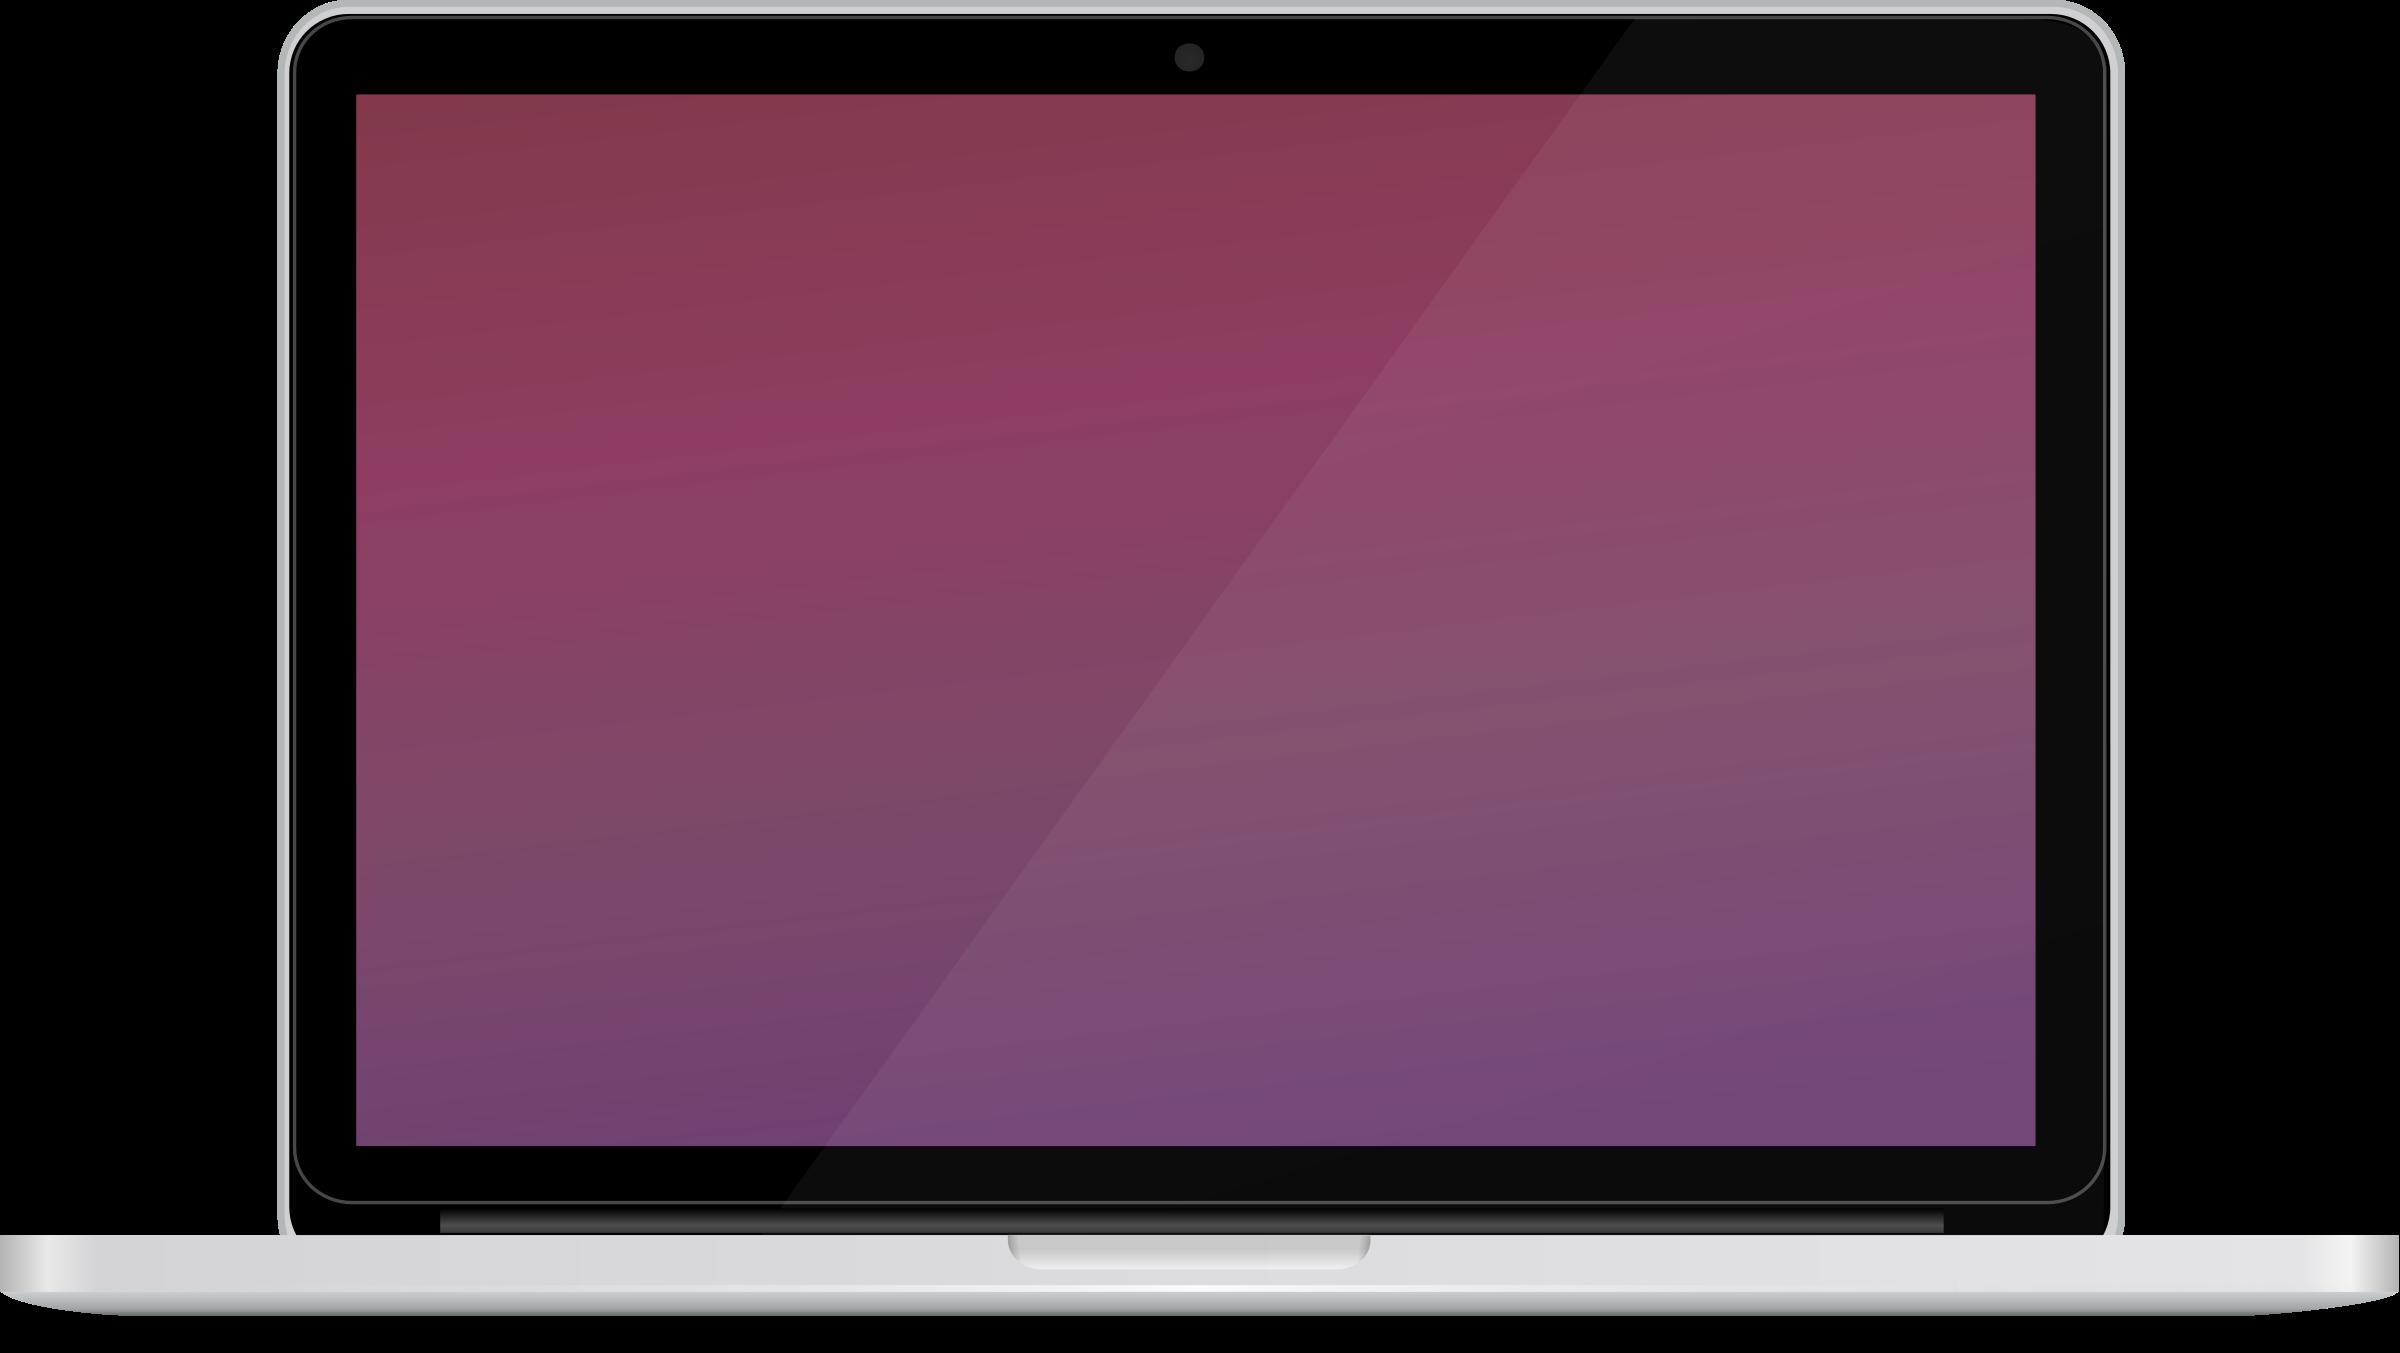 png download Moonbook retina laptop big. Violet clipart notebook